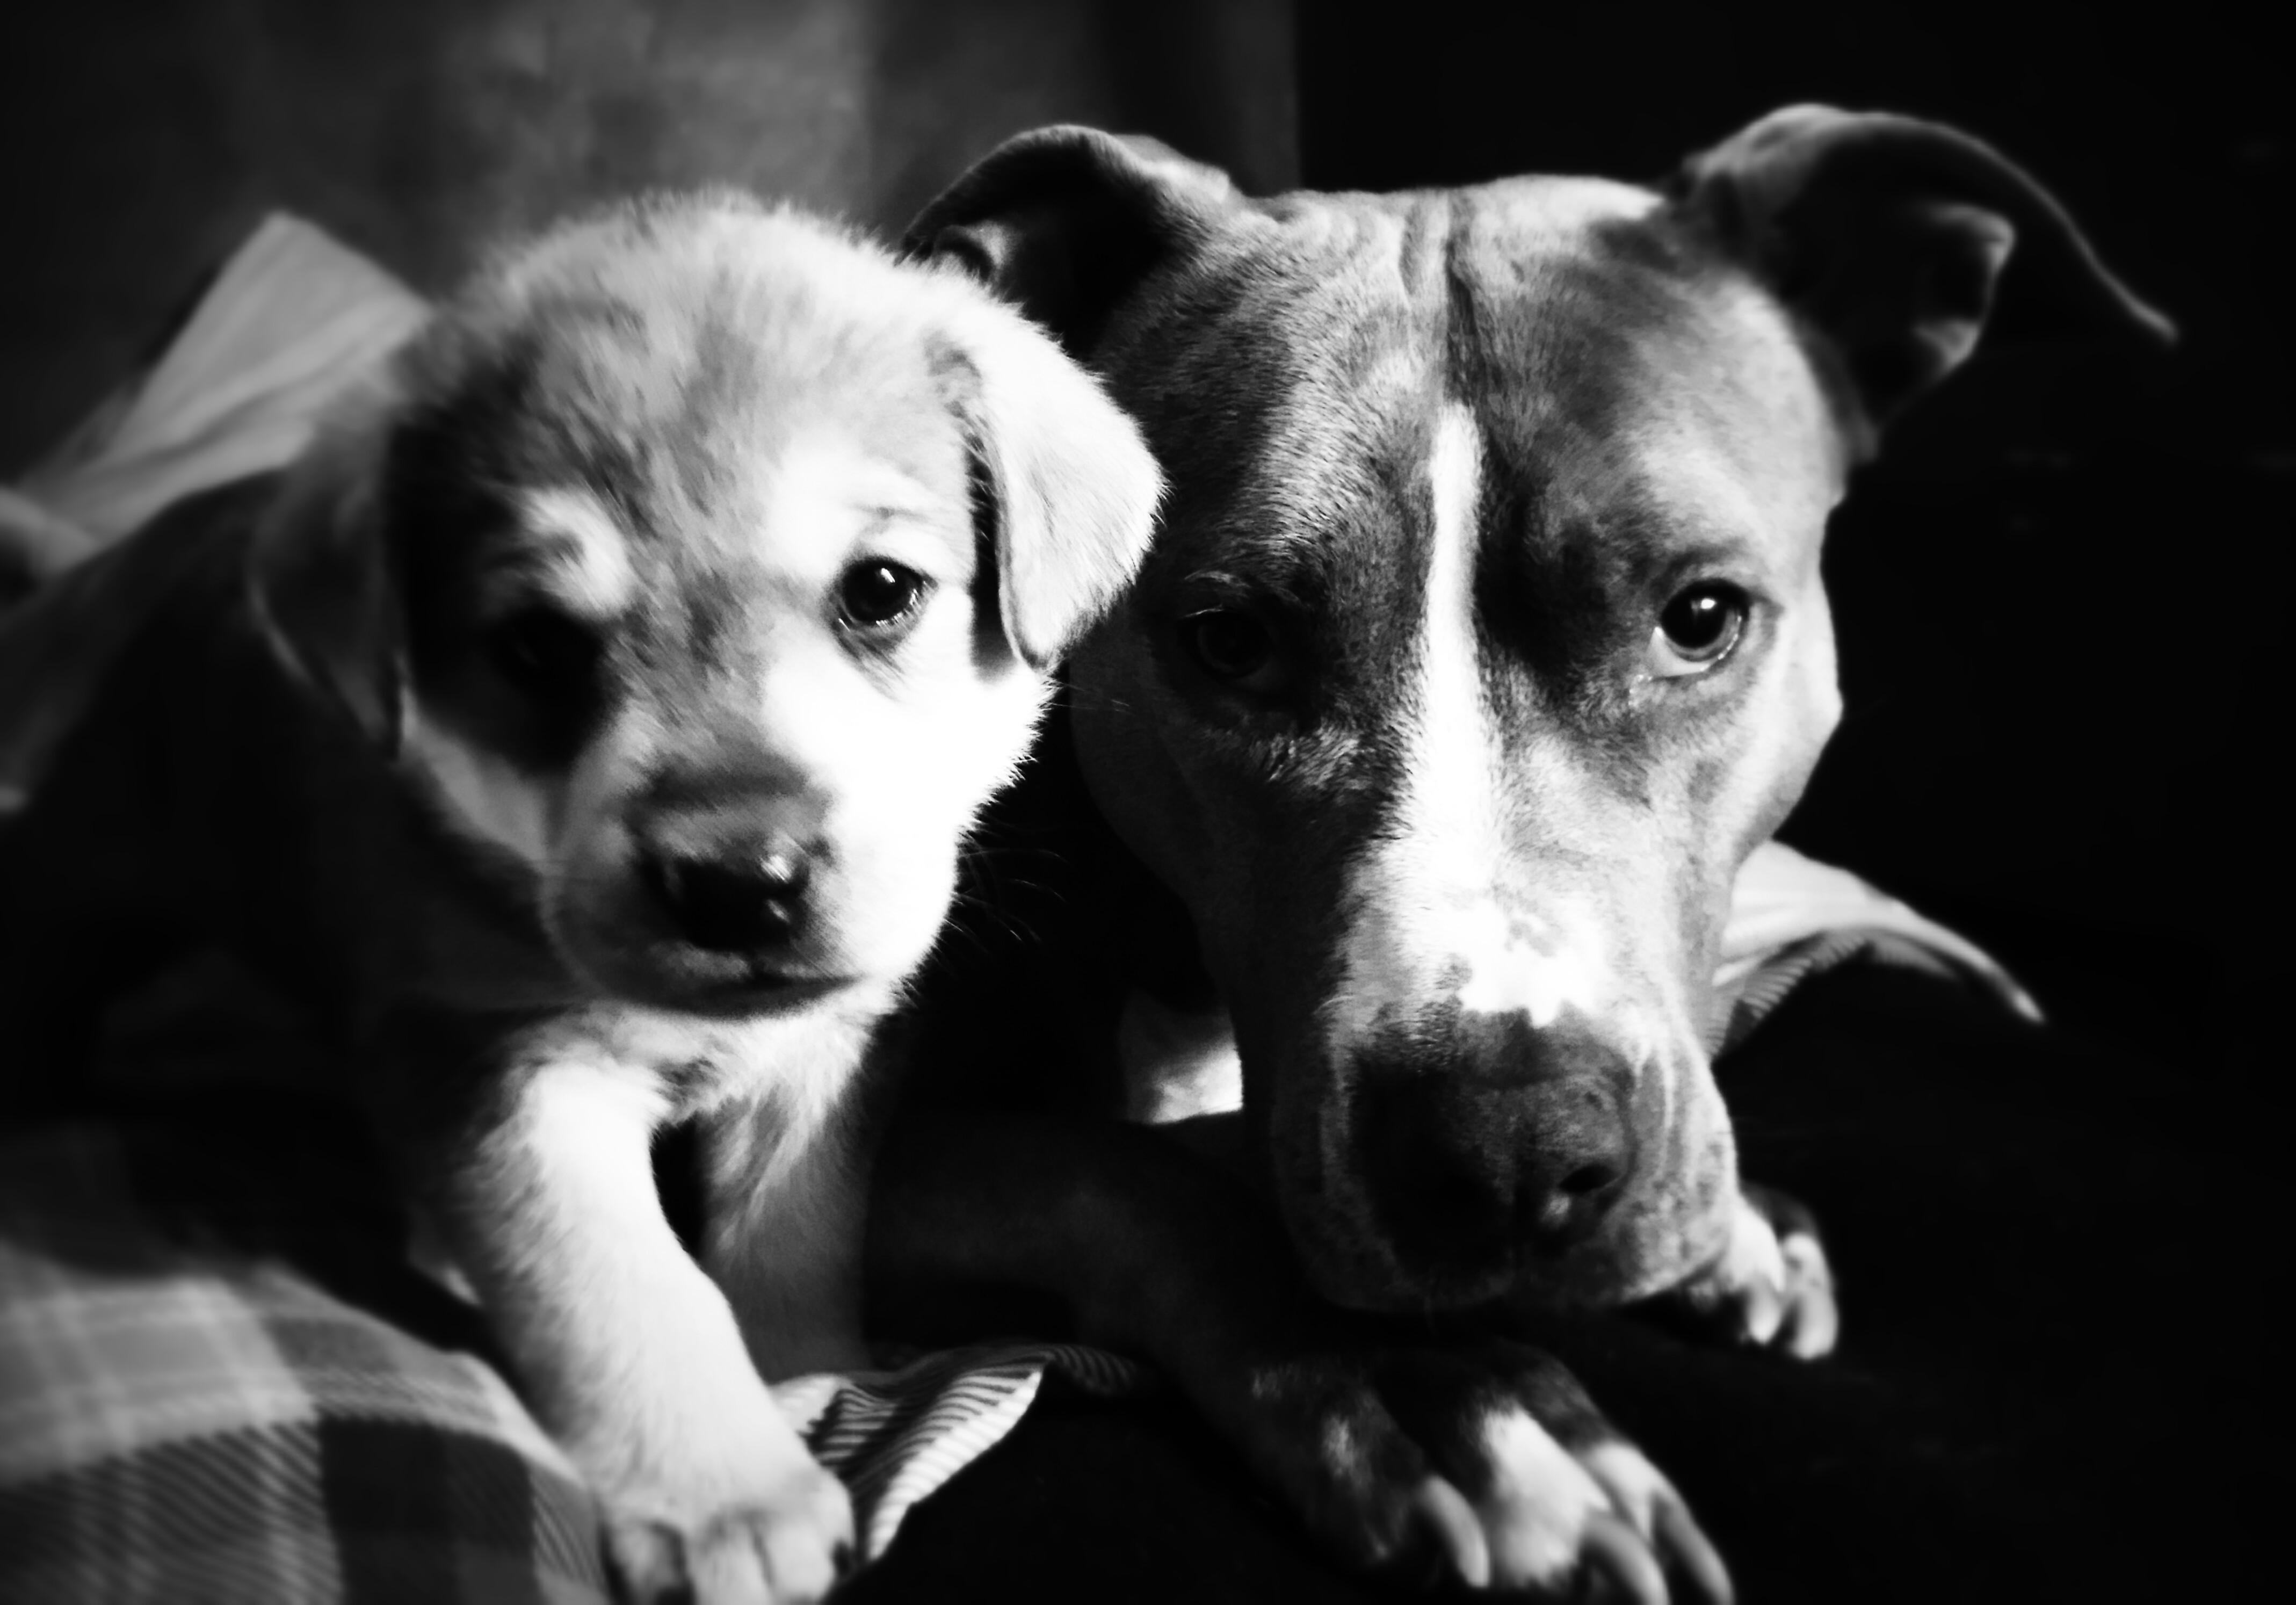 Lita socializing a puppy!